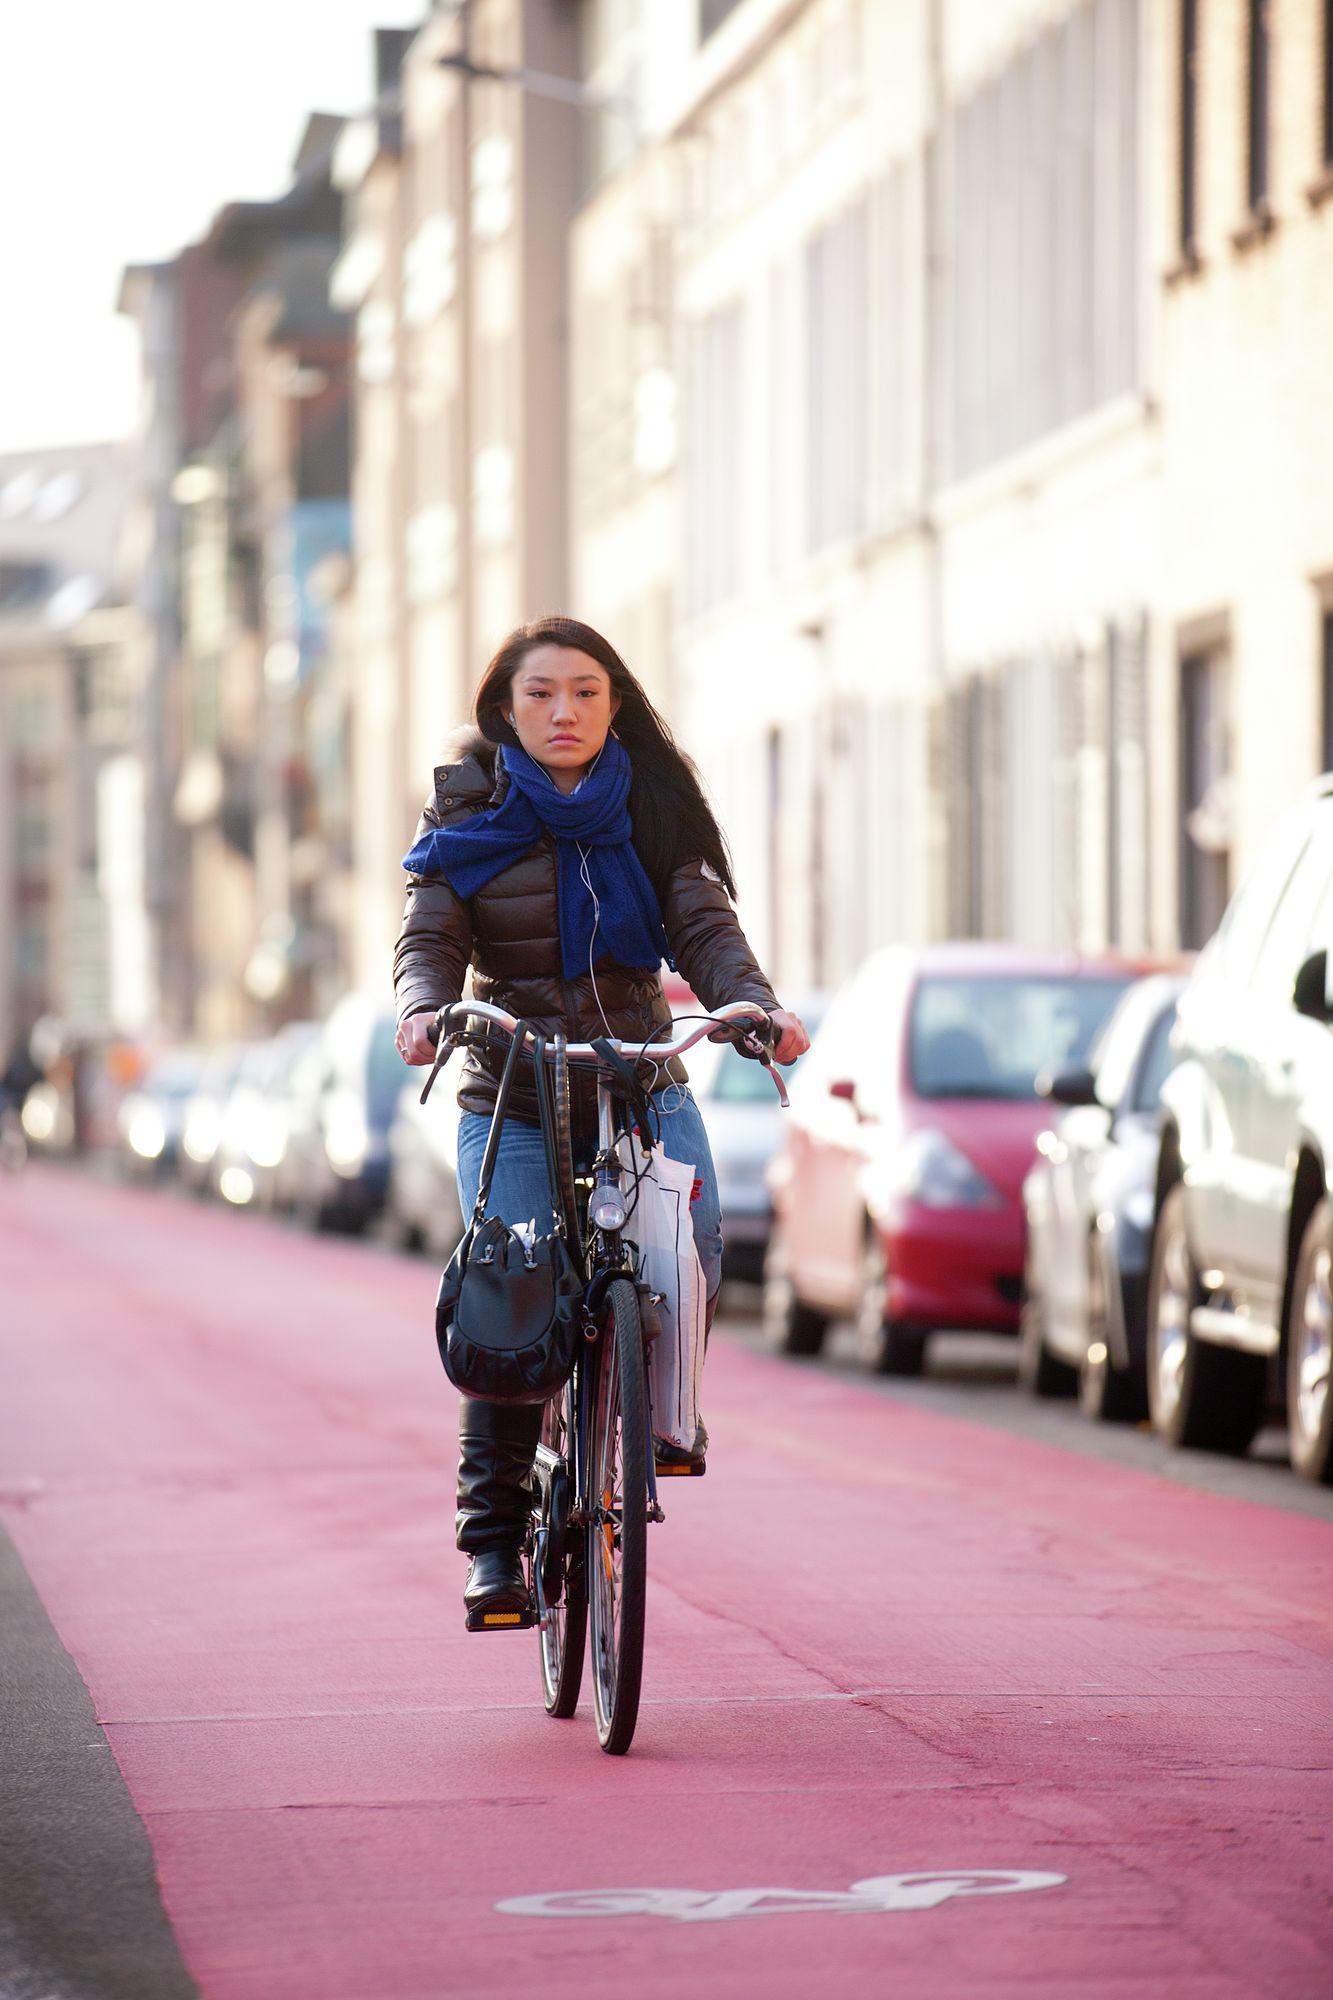 Mobiliteit_Gent-39.tif